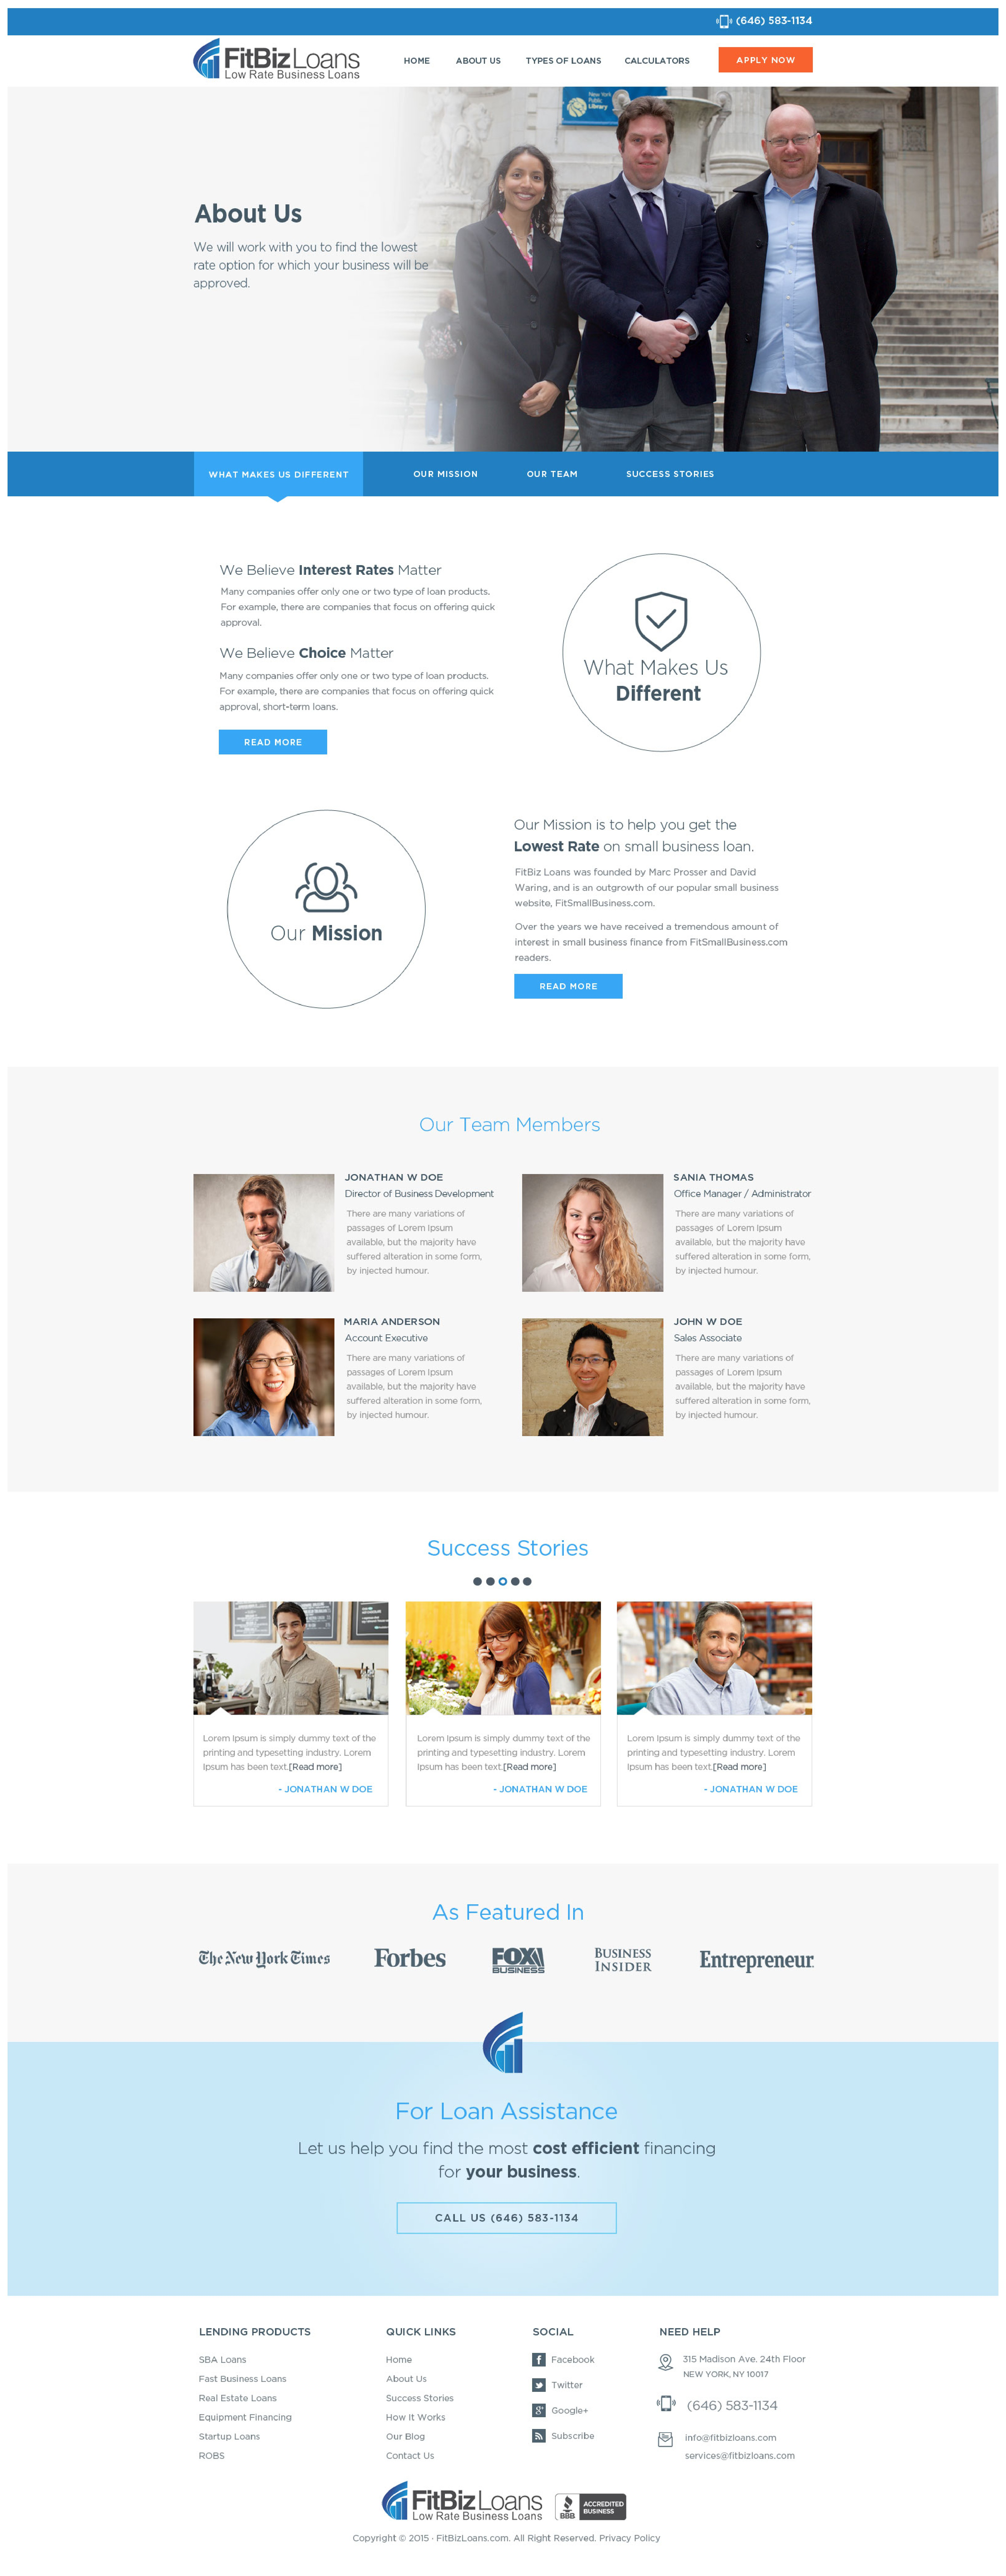 Create a modern, clean, professional site for FitBizLoans.com!